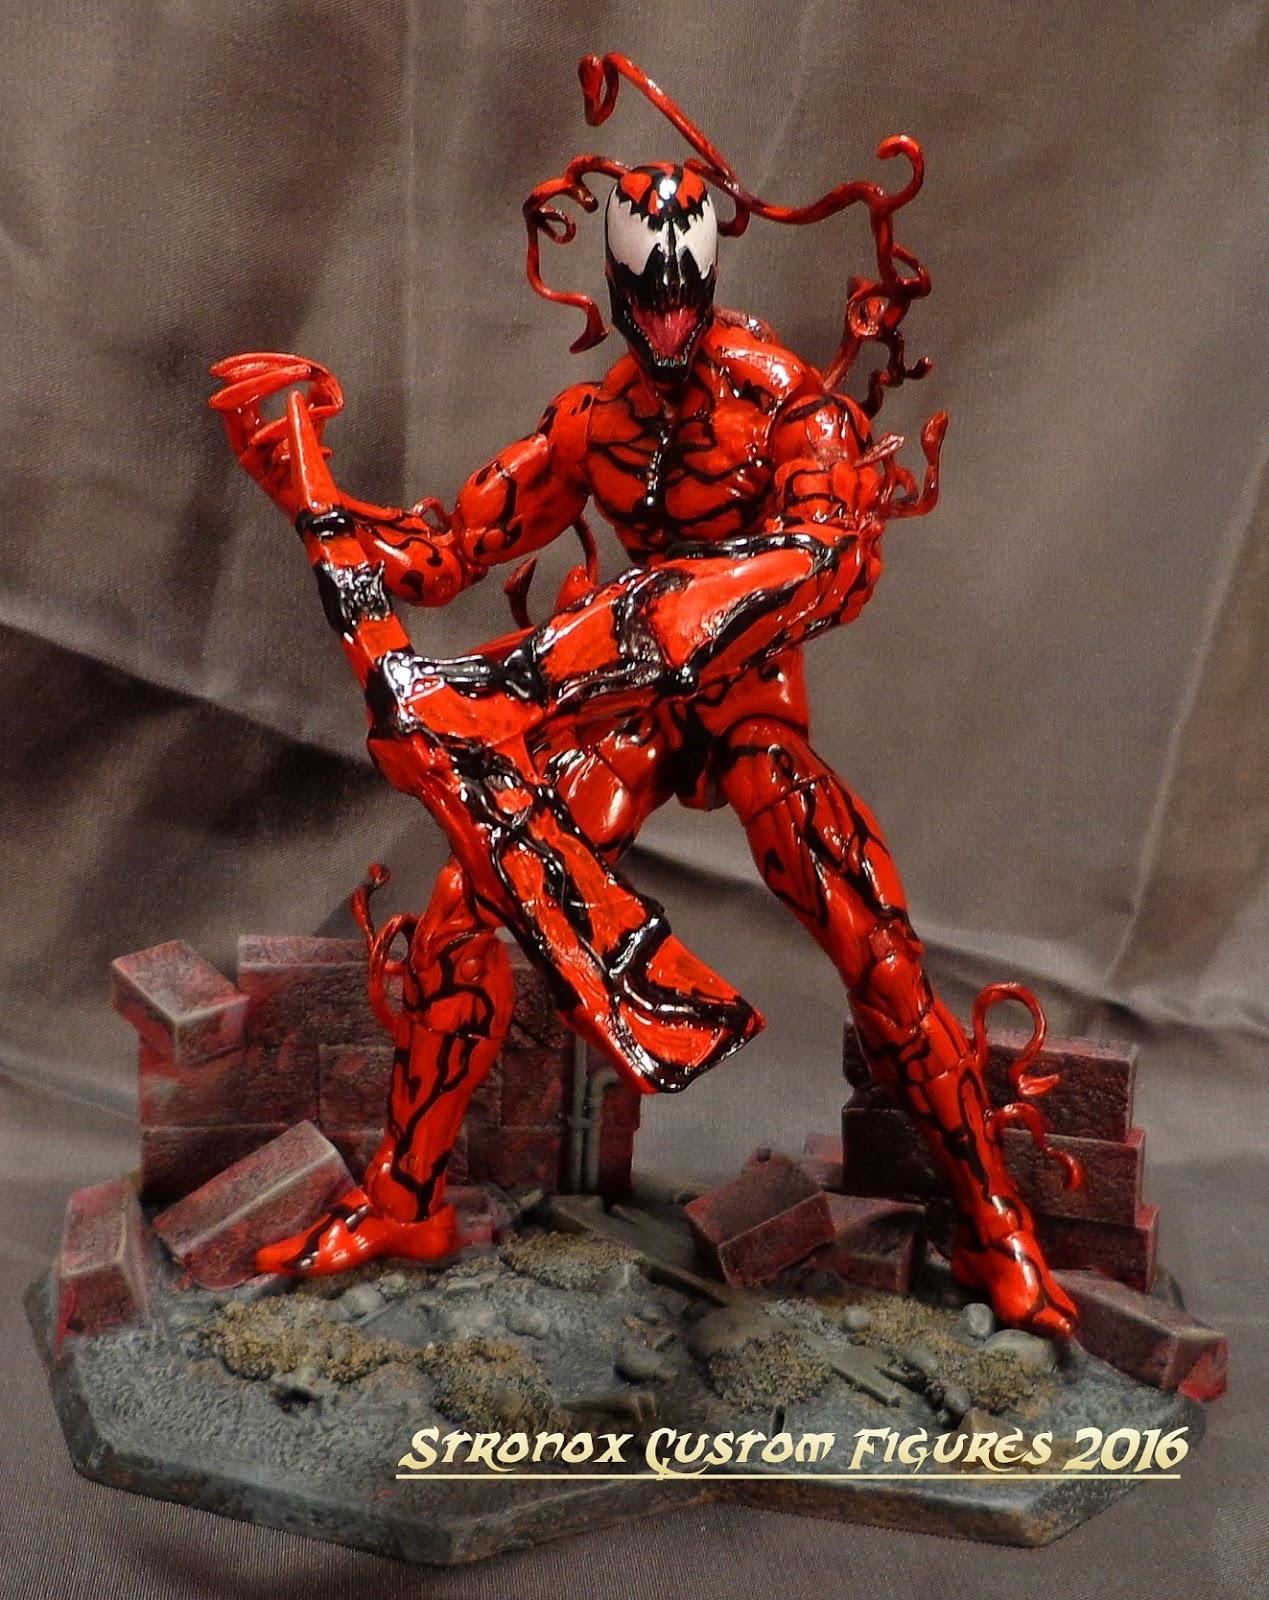 stronox custom figures marvel legends carnage